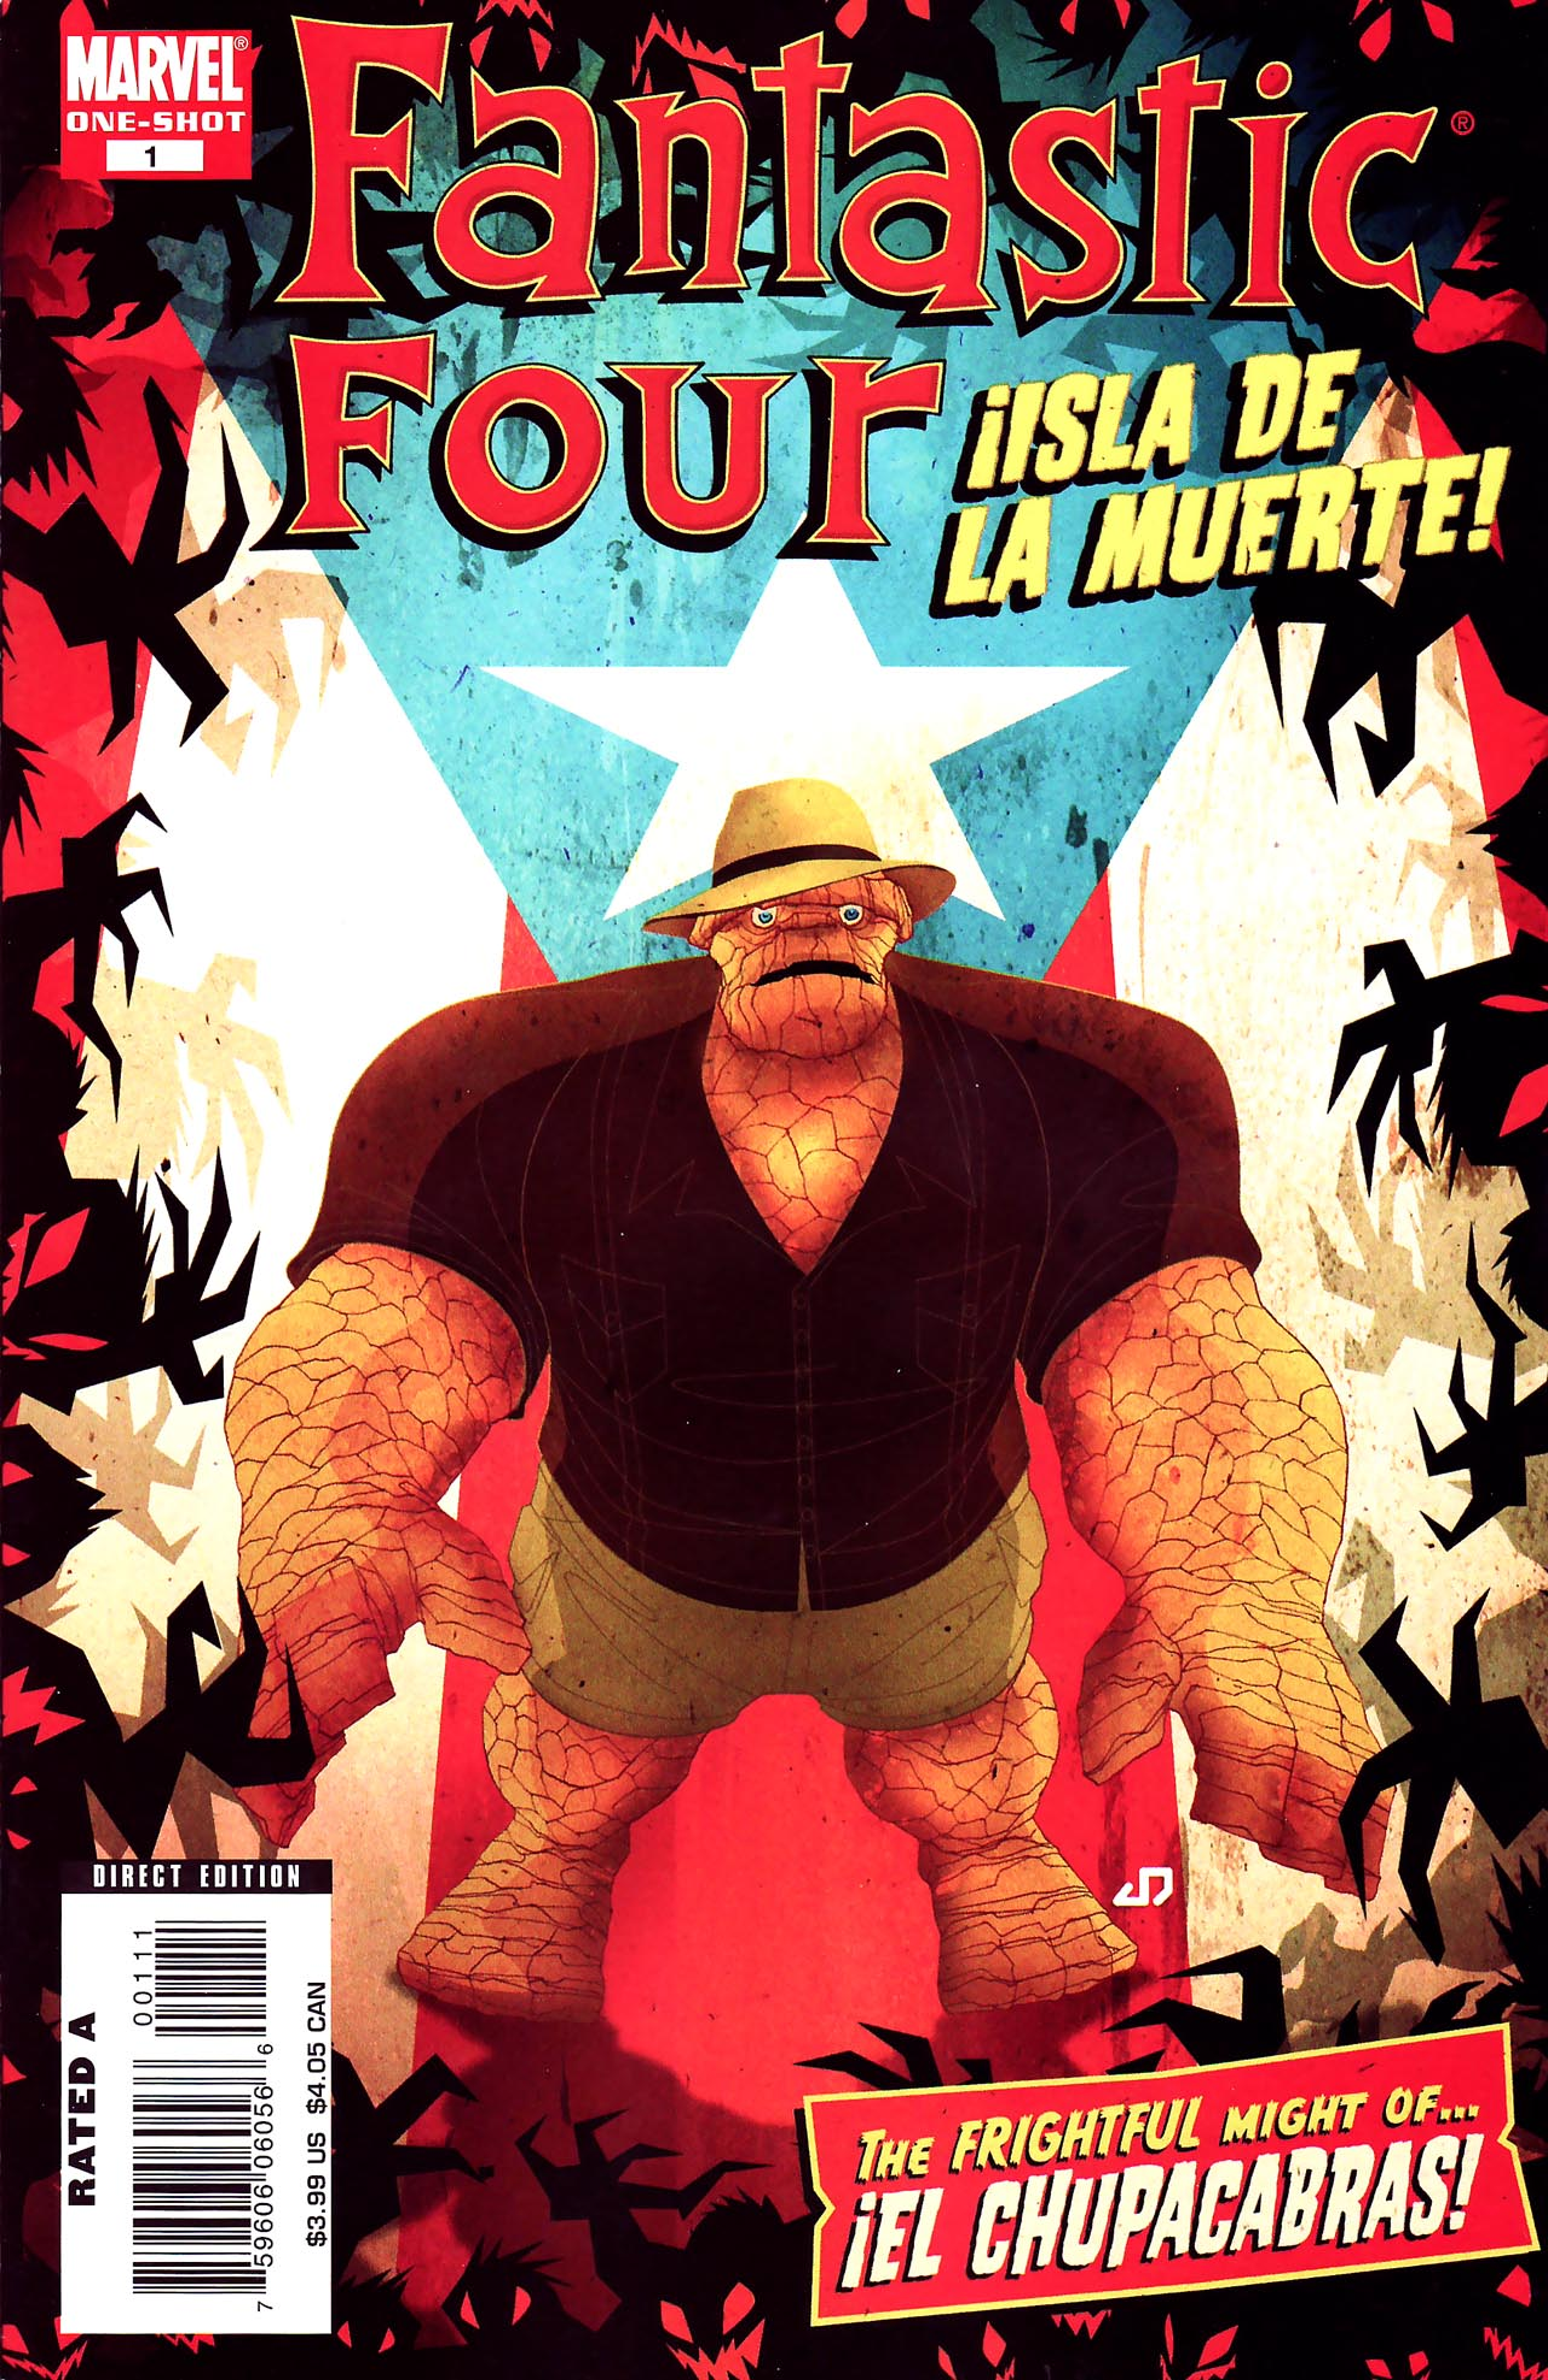 Fantastic Four ¡Isla de la Muerte! Vol 1 1.jpg